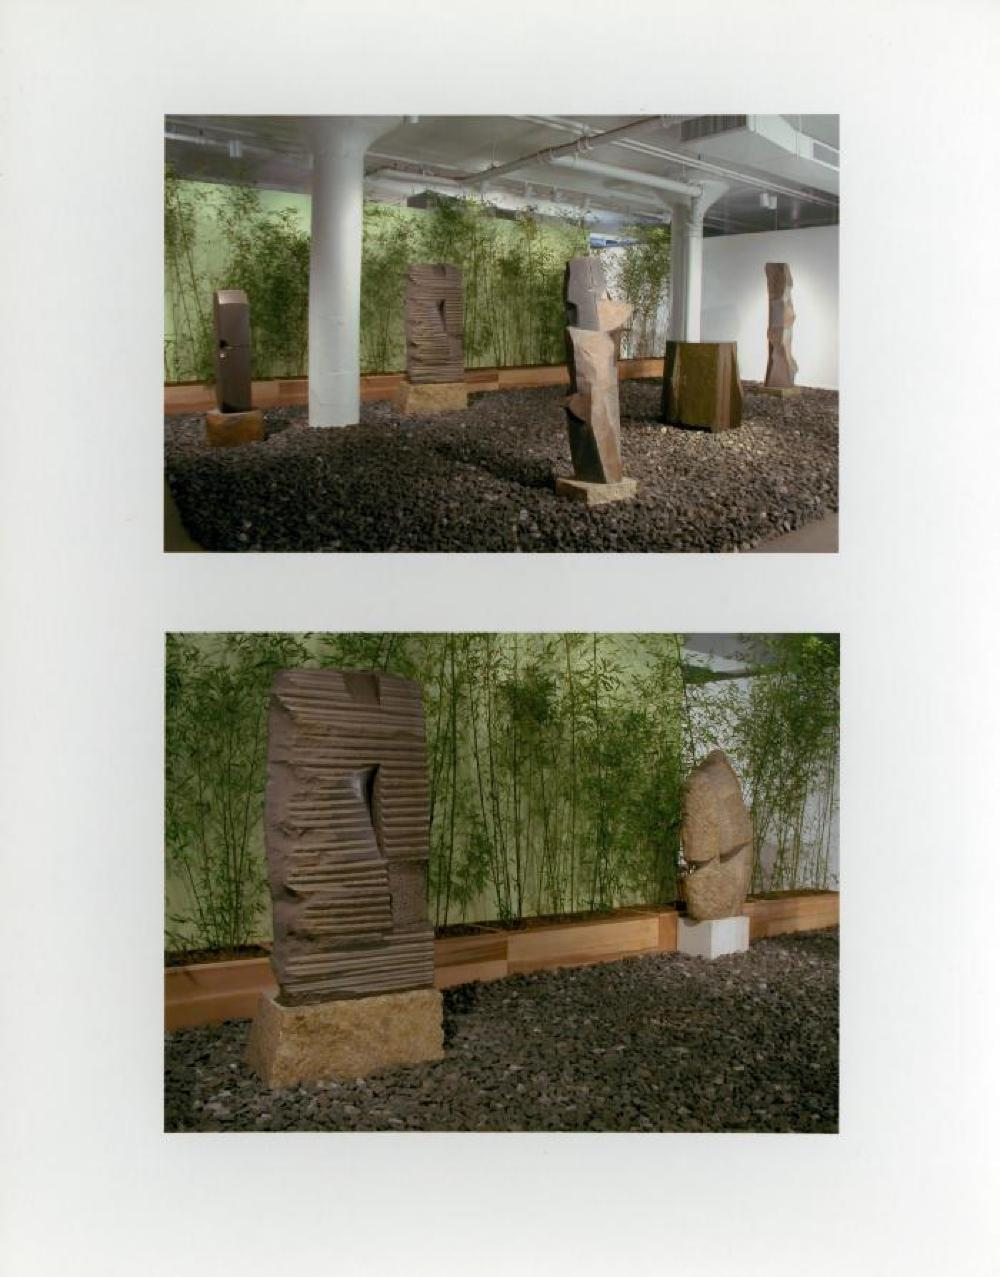 """Sculpture and Nature,"" The Noguchi Museum, Sunnyside, June 29, 2002 - January 13, 2003."